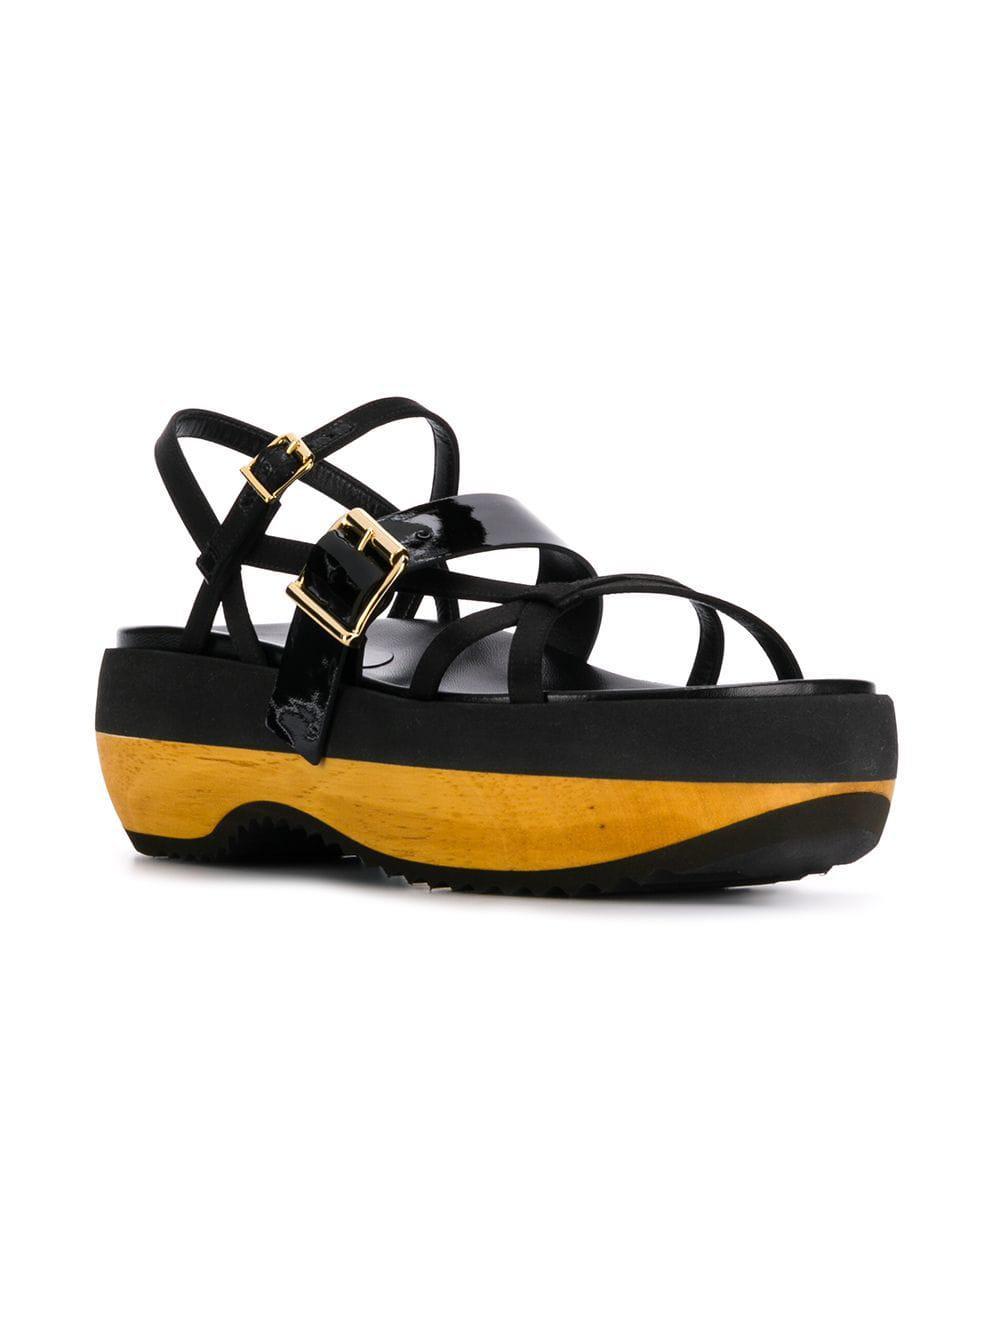 9a7eba9cdaf8 Lyst - Marni Platform Fussbett Sandals in Black